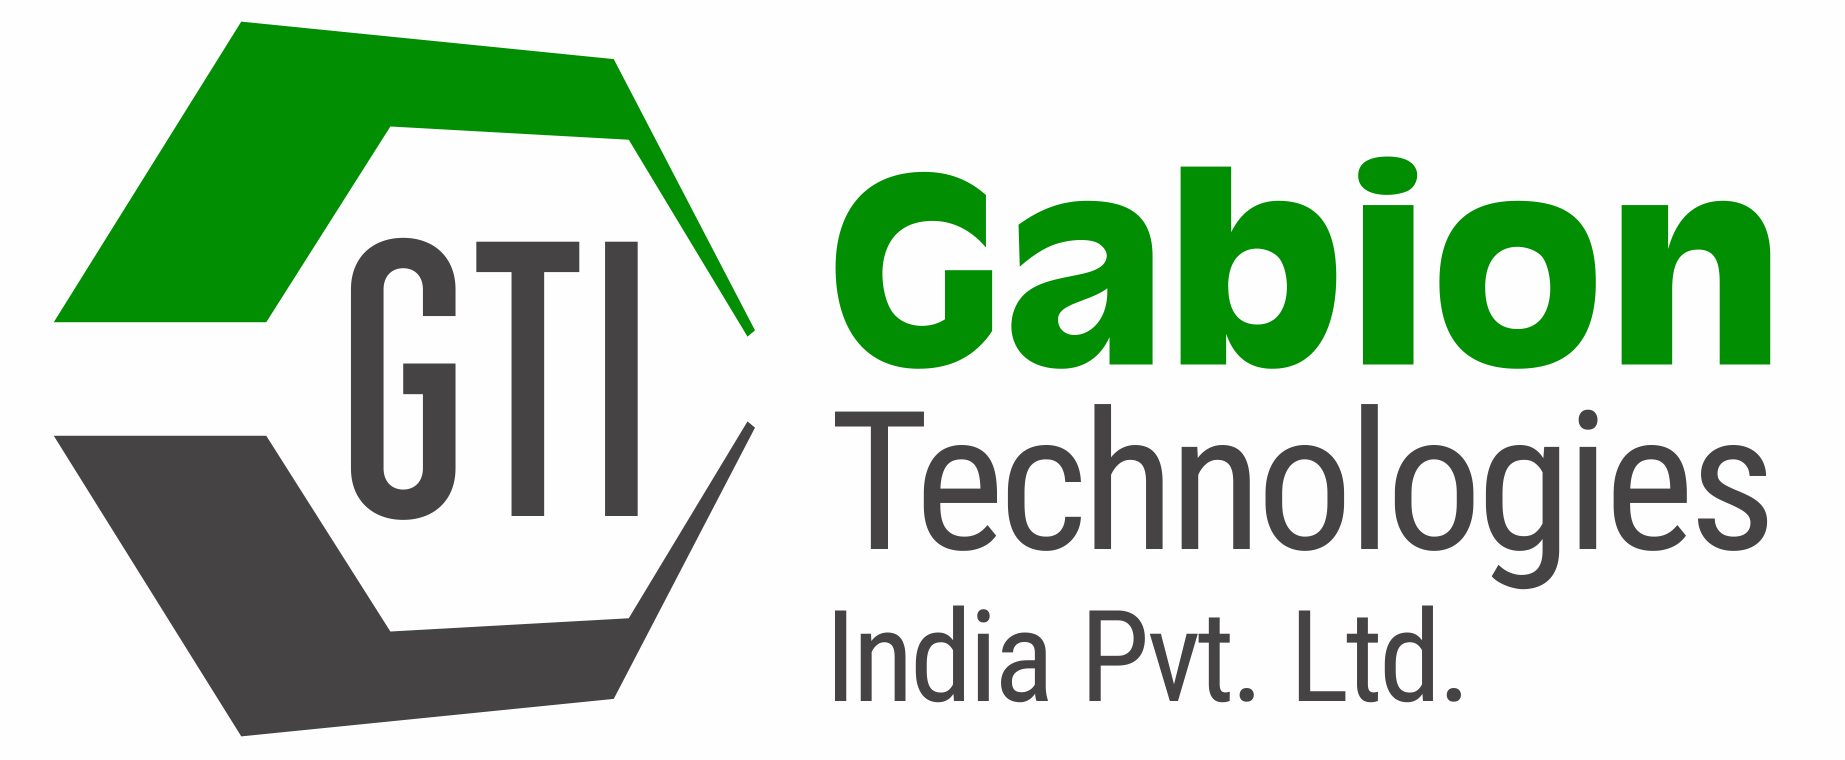 Gabion Technologies (India) Pvt  Ltd  - Manufacturer and Geo